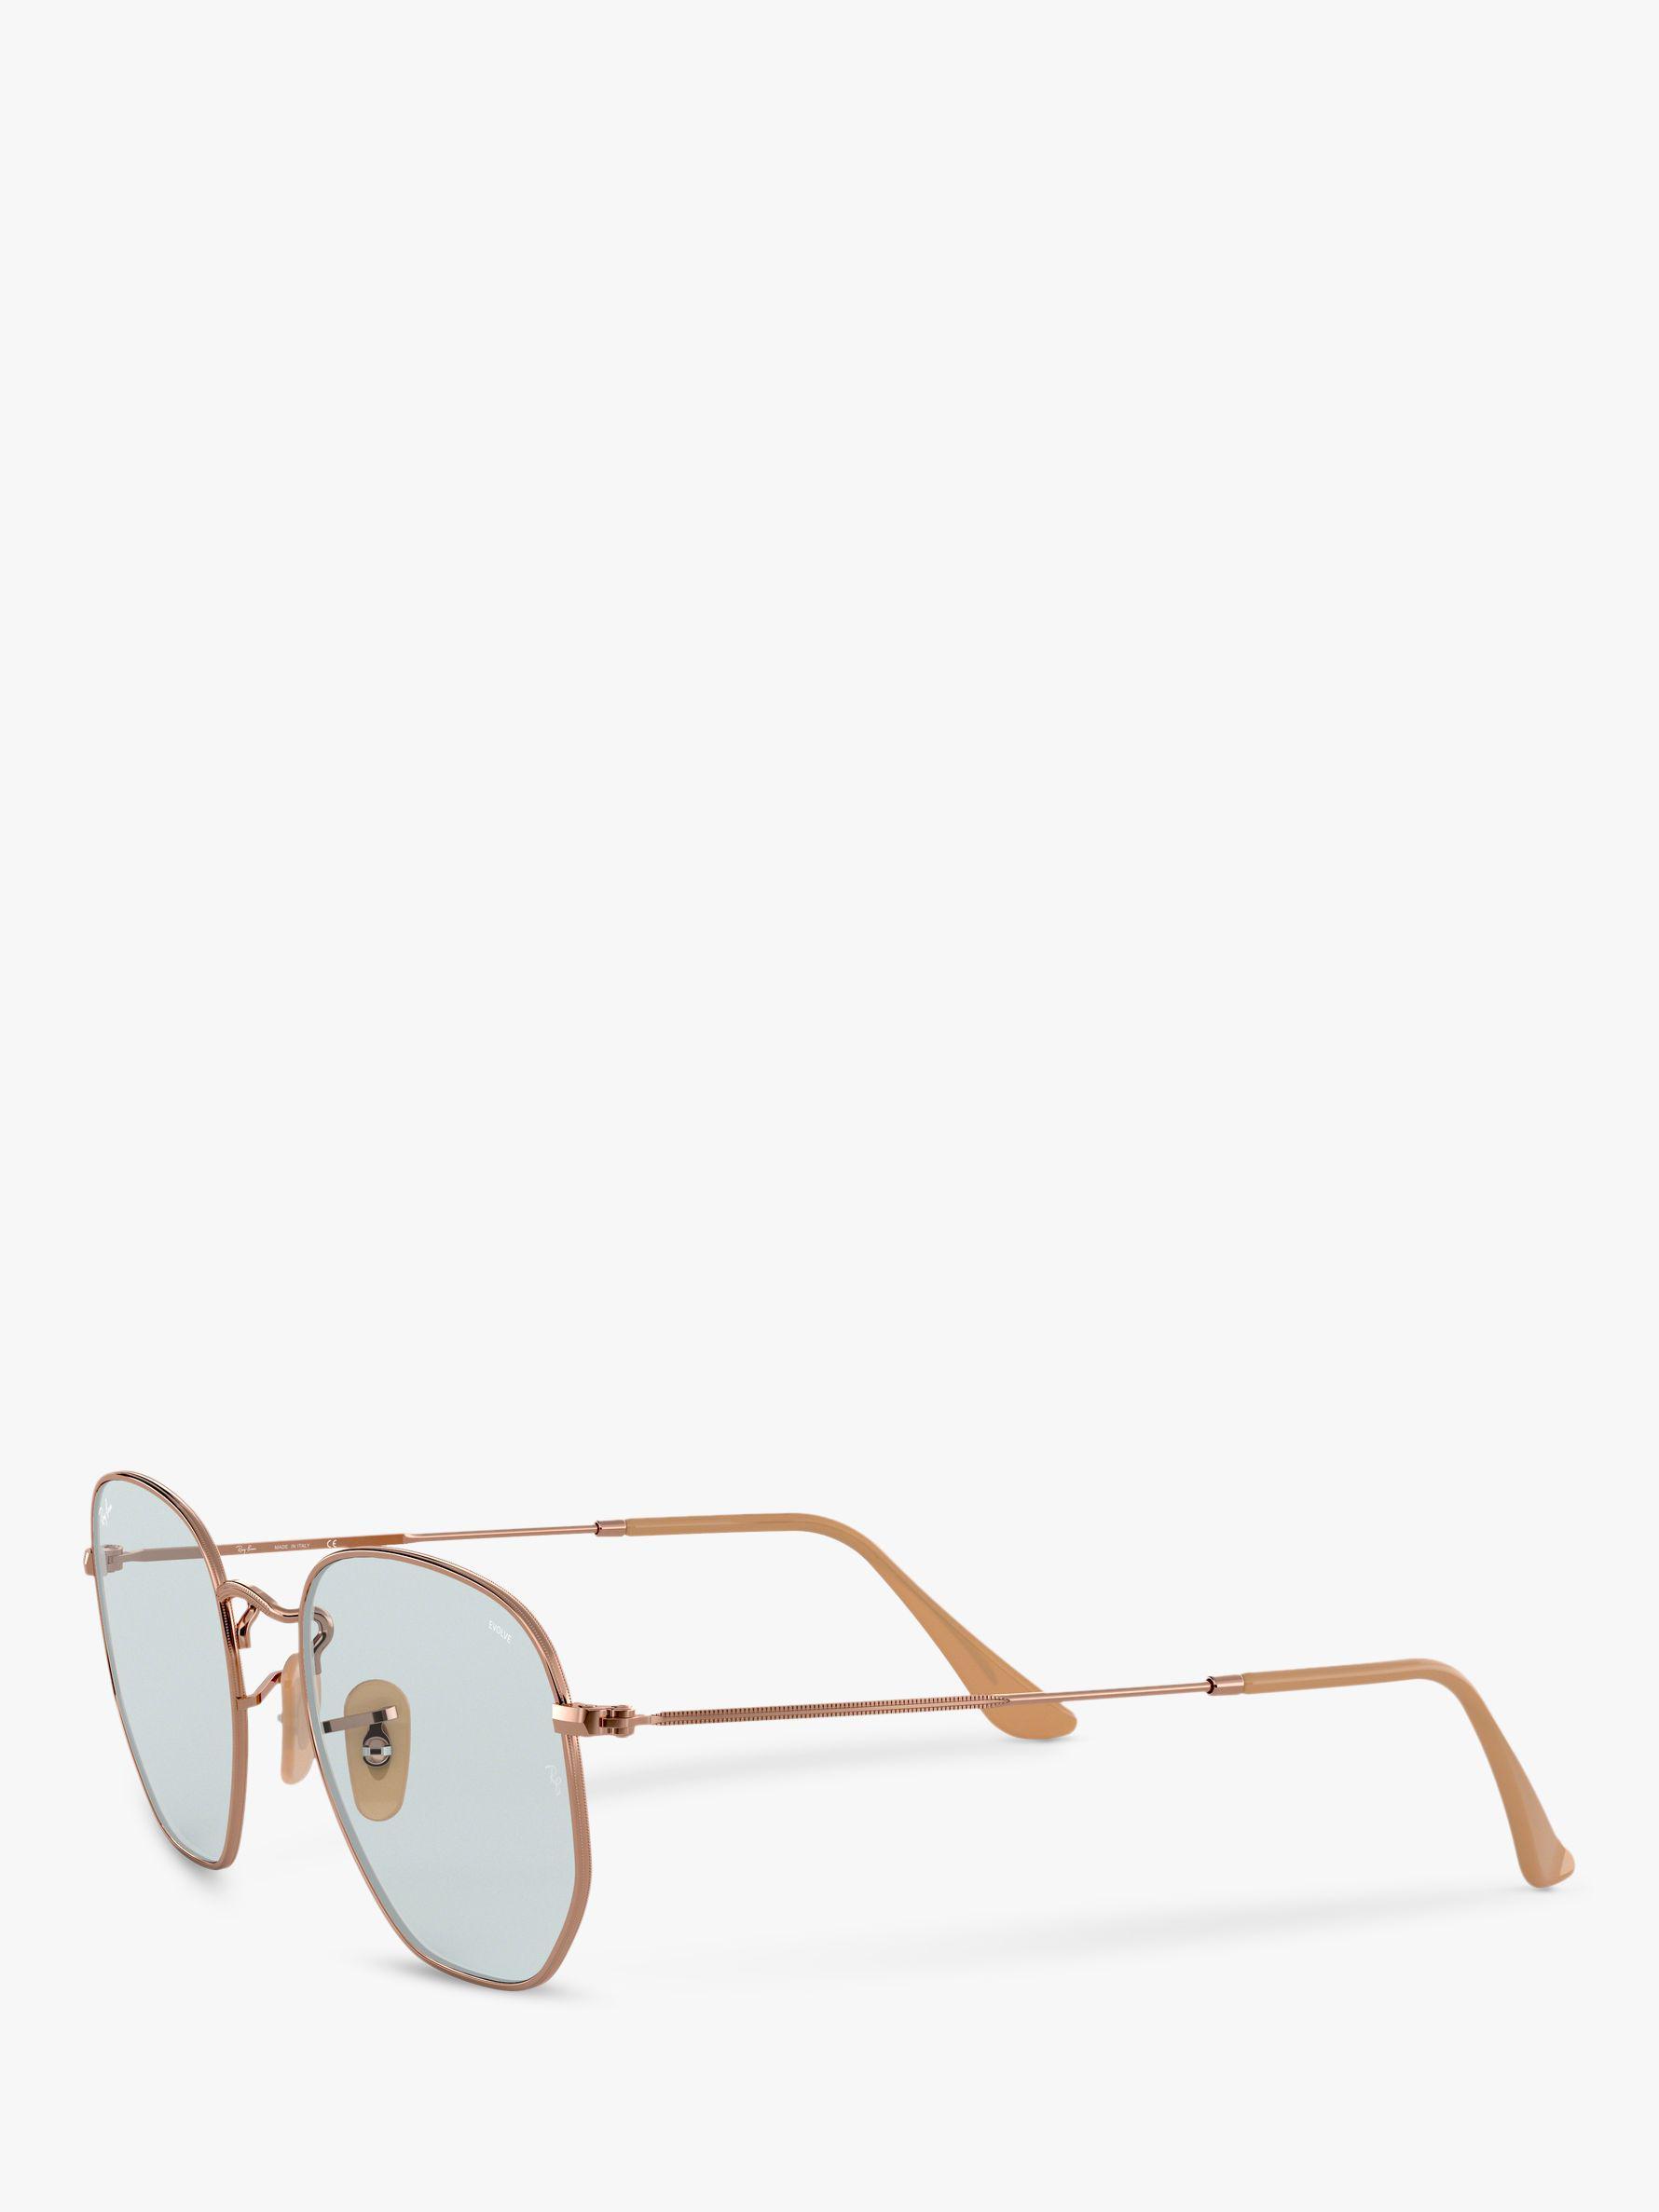 0881196db6b Ray-Ban Rb3548n Hexgonal Sunglasses - Lyst